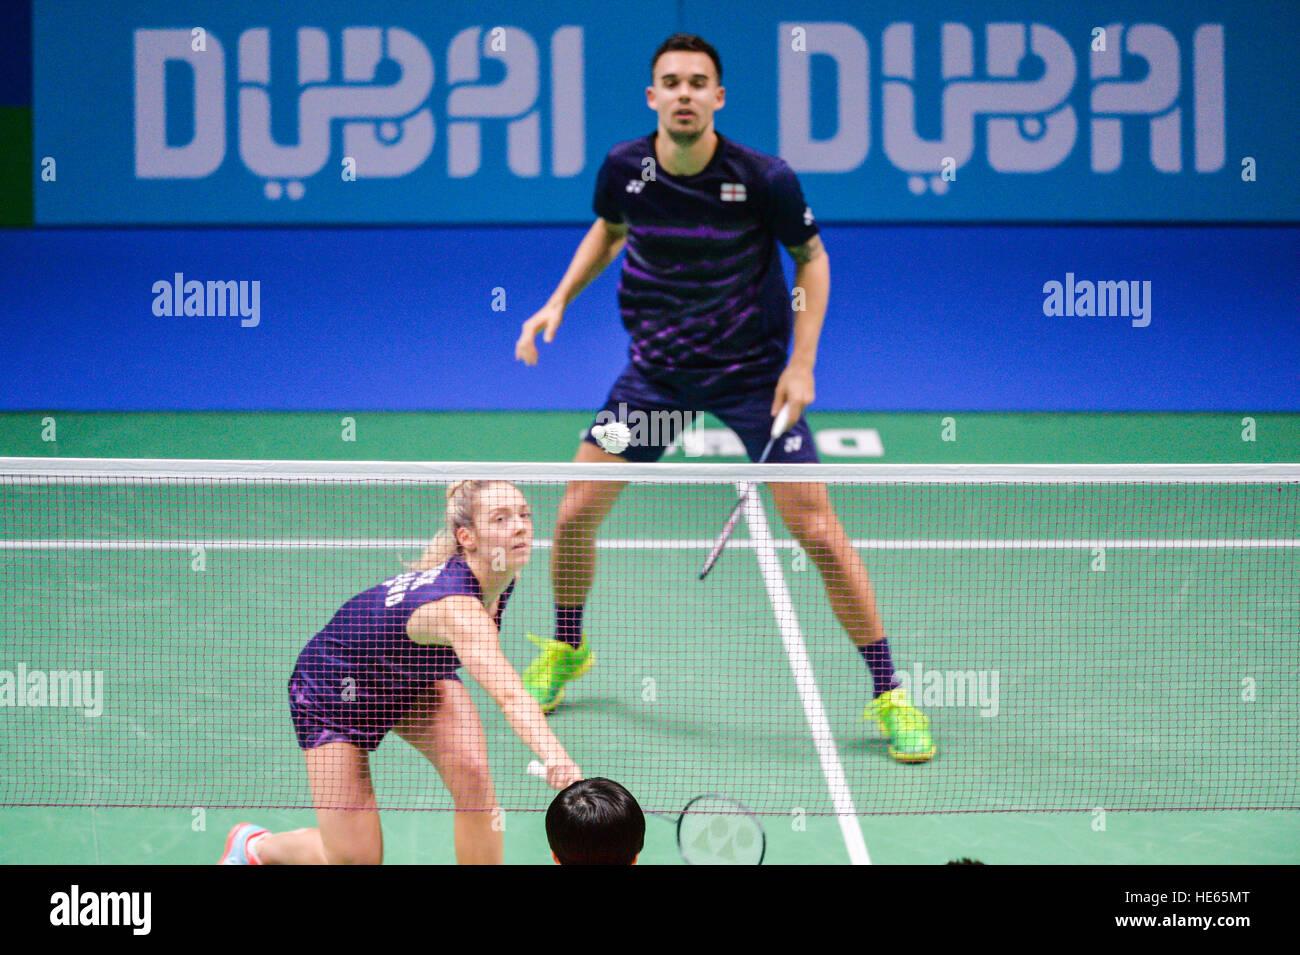 DUBAI UAE 18th Dec 2016 BWF 2015 mixed doubles champions Chris